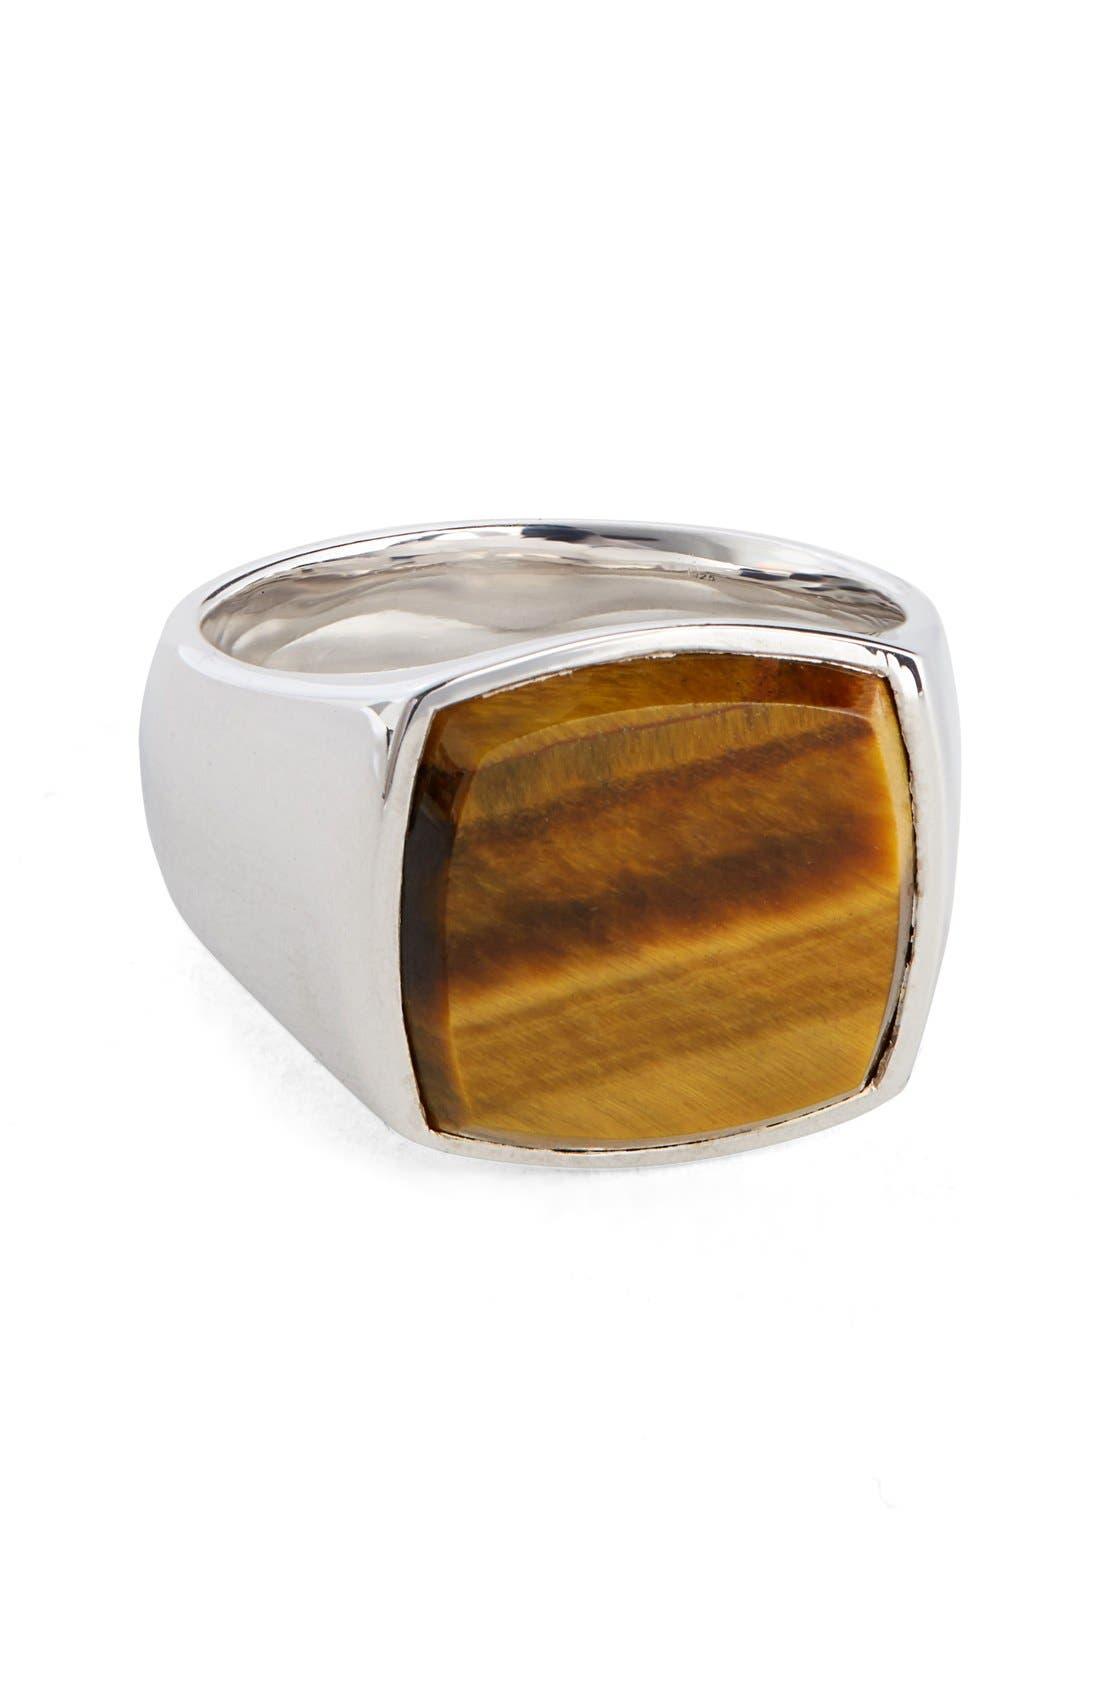 'Patriot Collection' Cushion Tiger's Eye Signet Ring,                             Main thumbnail 1, color,                             040